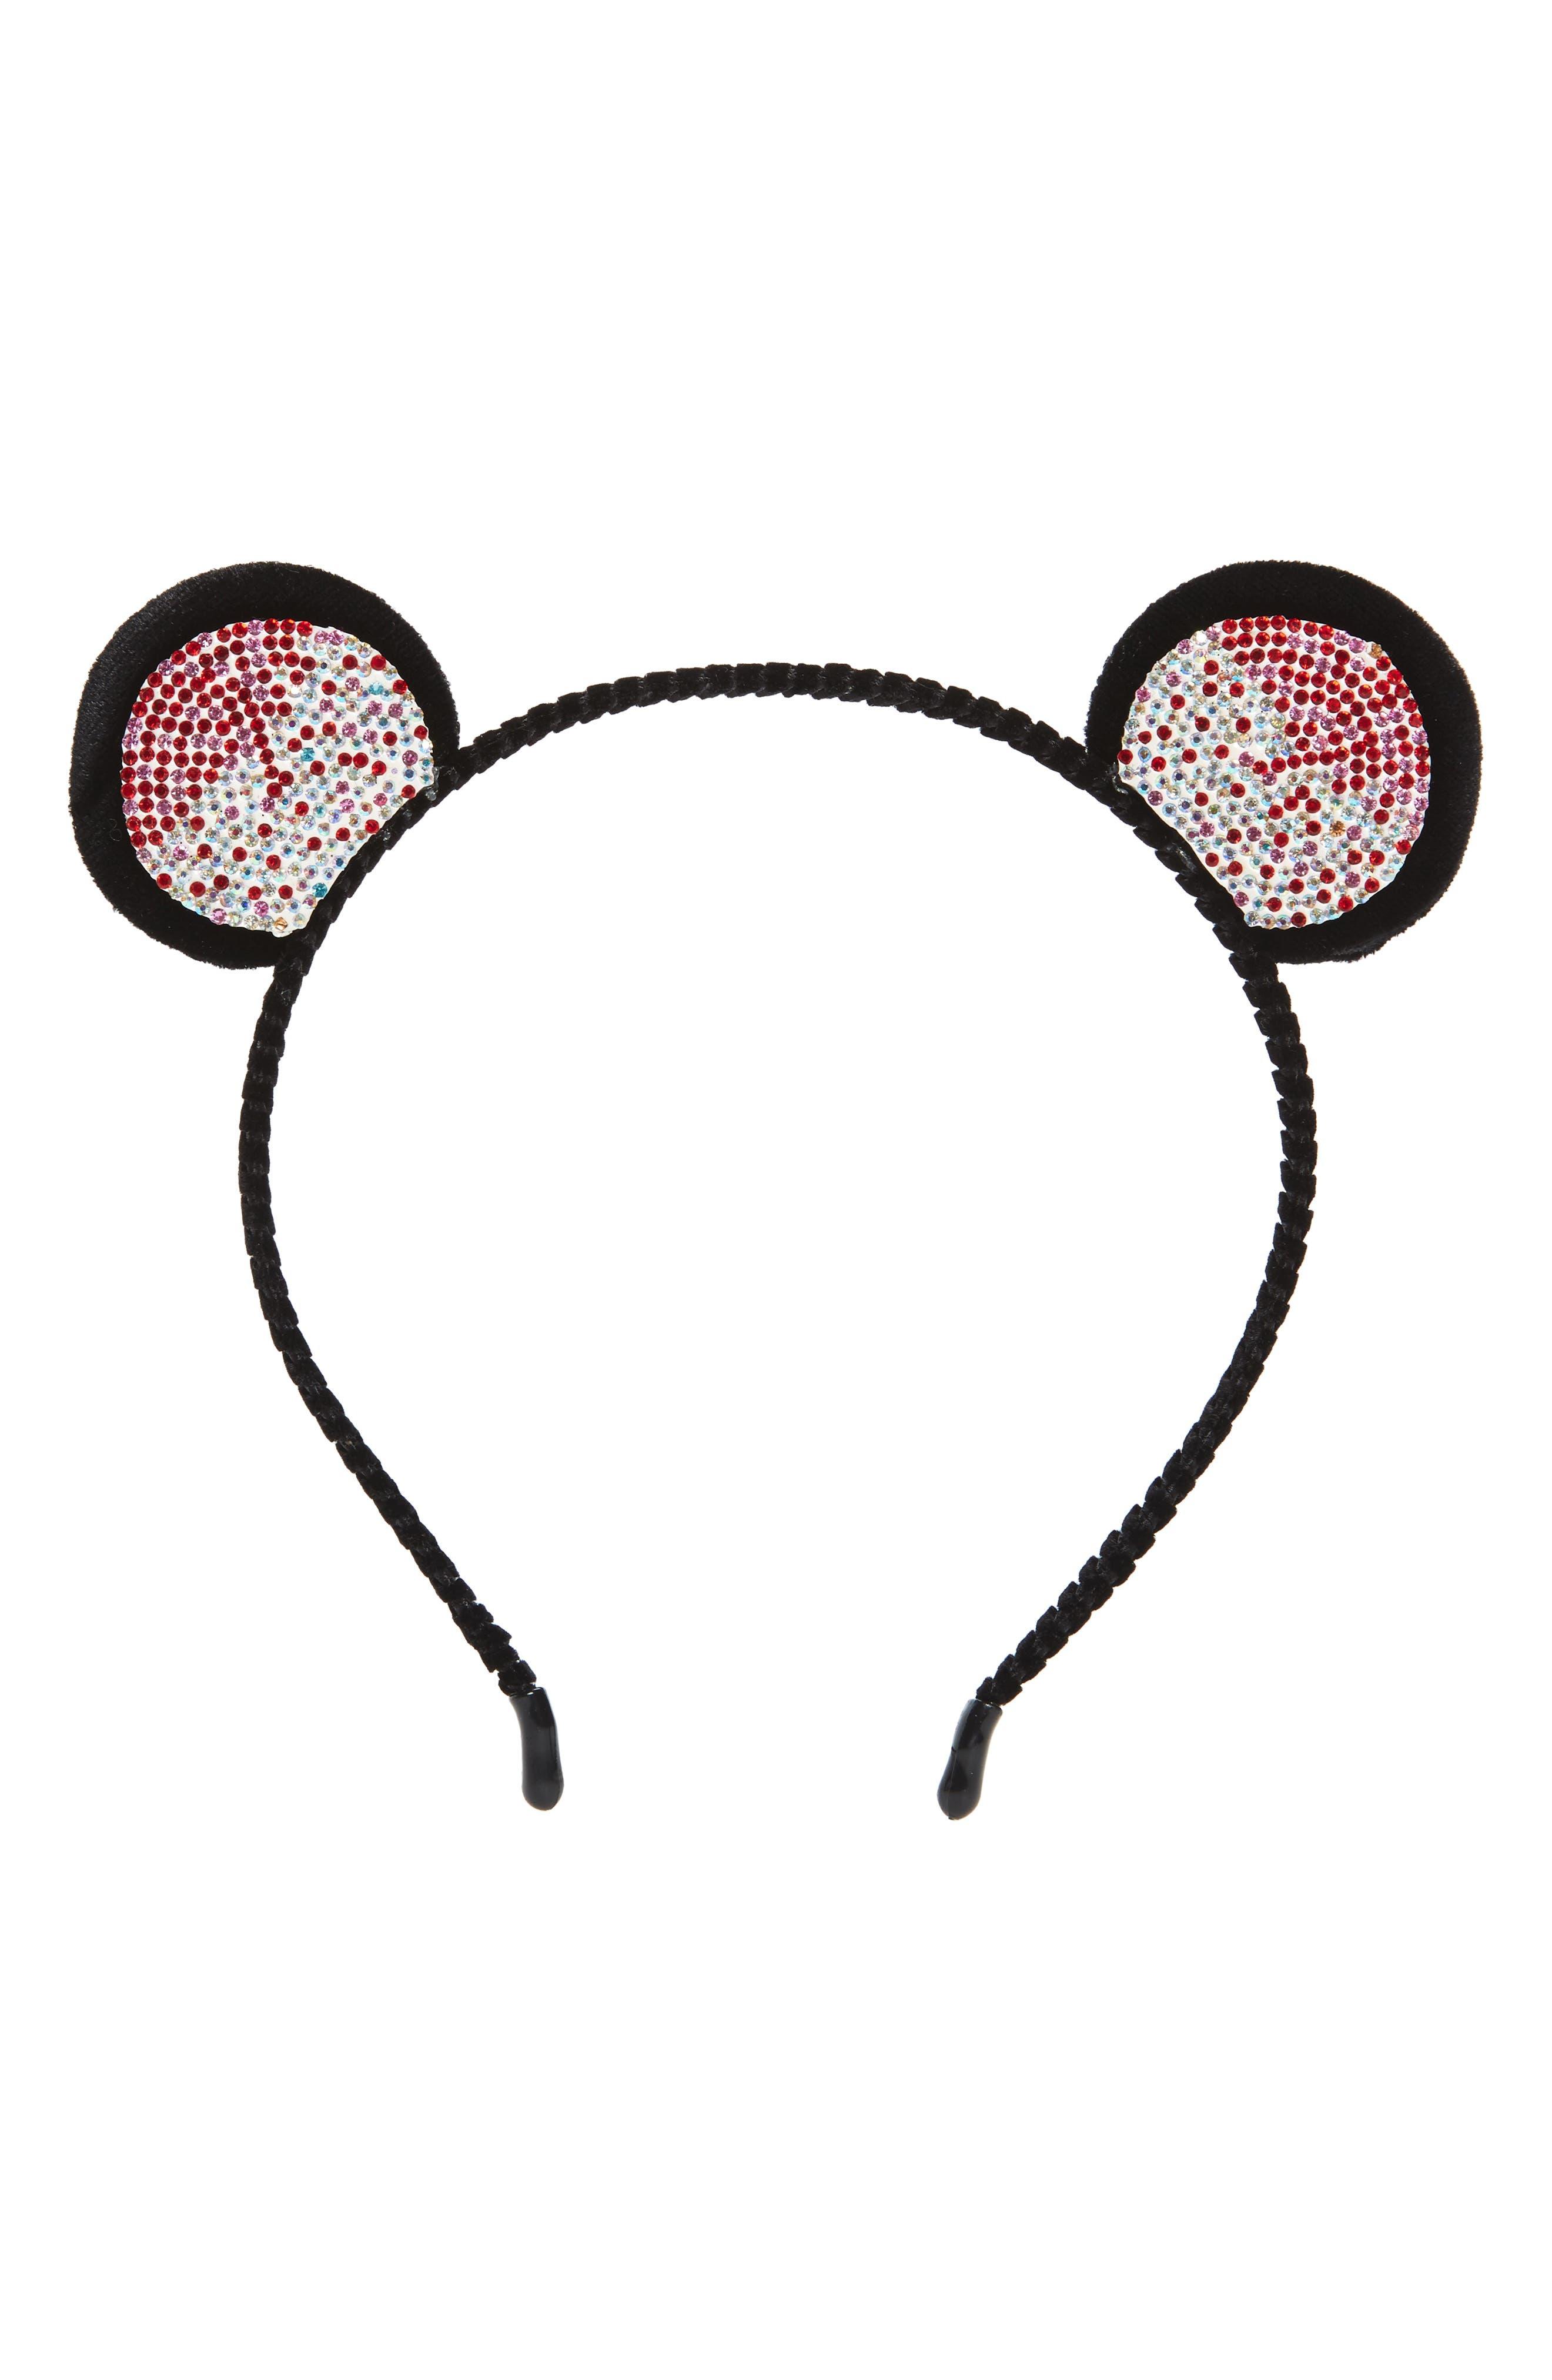 Crystal Bear Ear Headband,                             Main thumbnail 1, color,                             Black